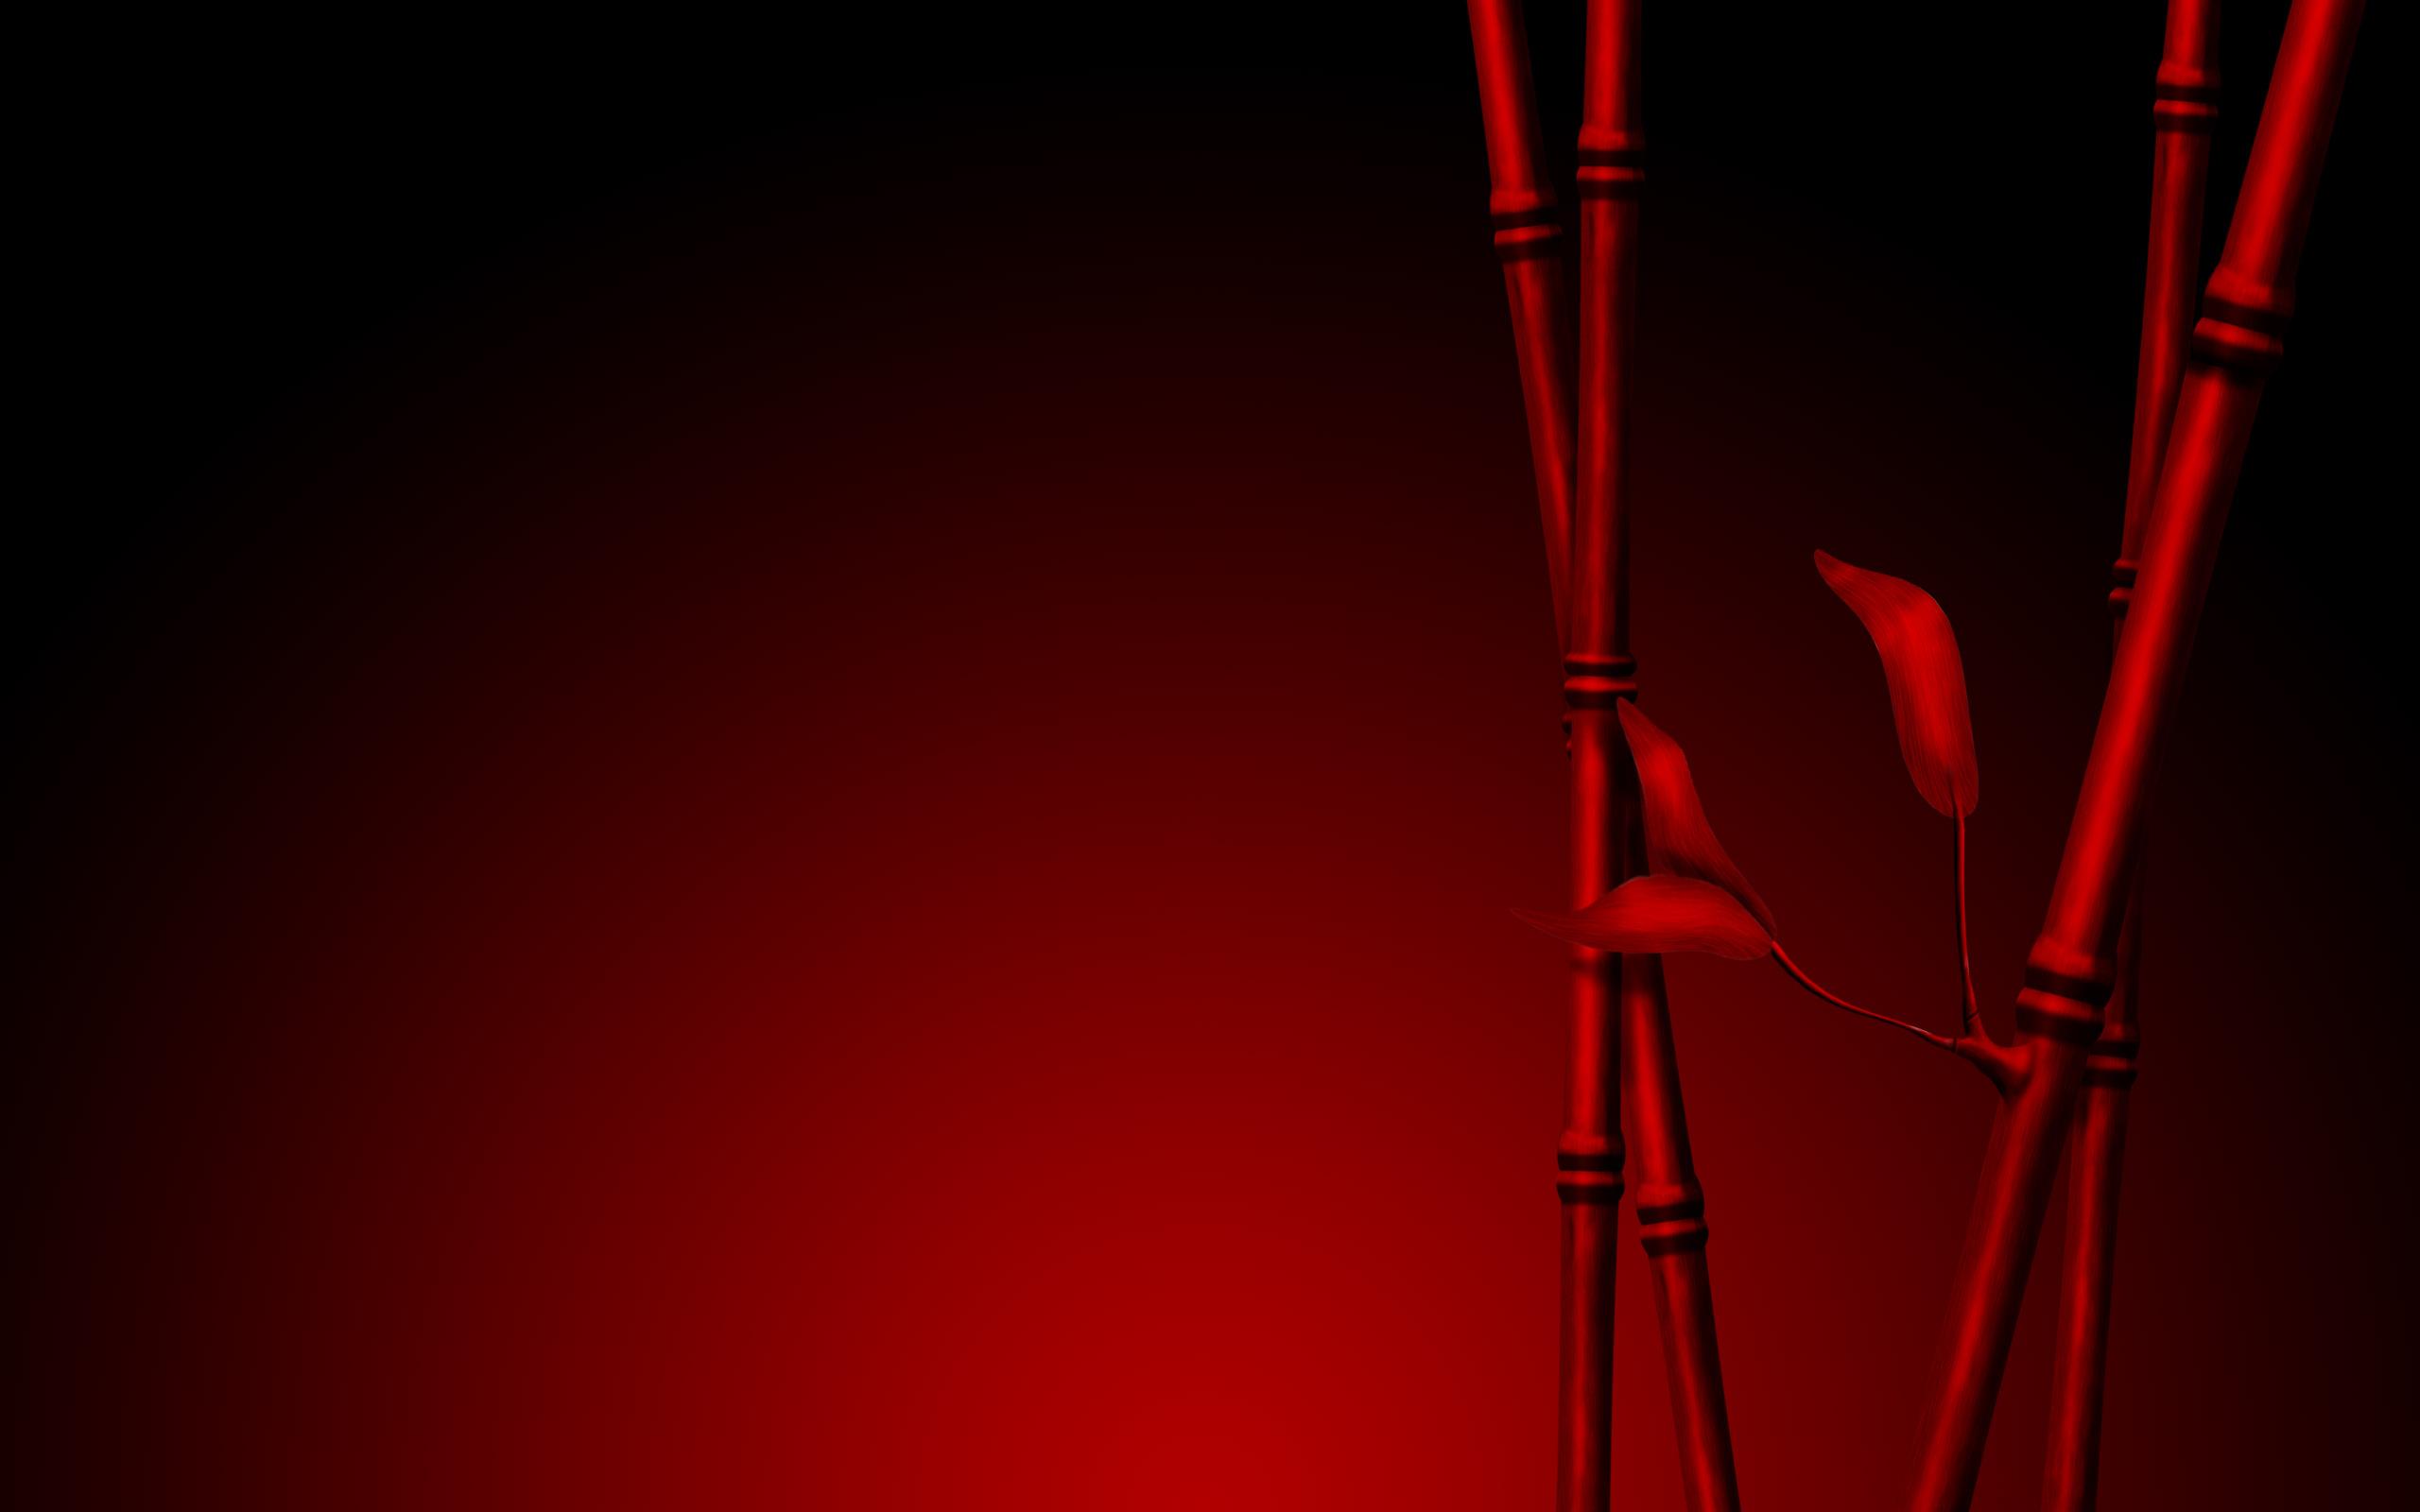 Red And Black Wallpaper Designs 21 Widescreen Wallpaper